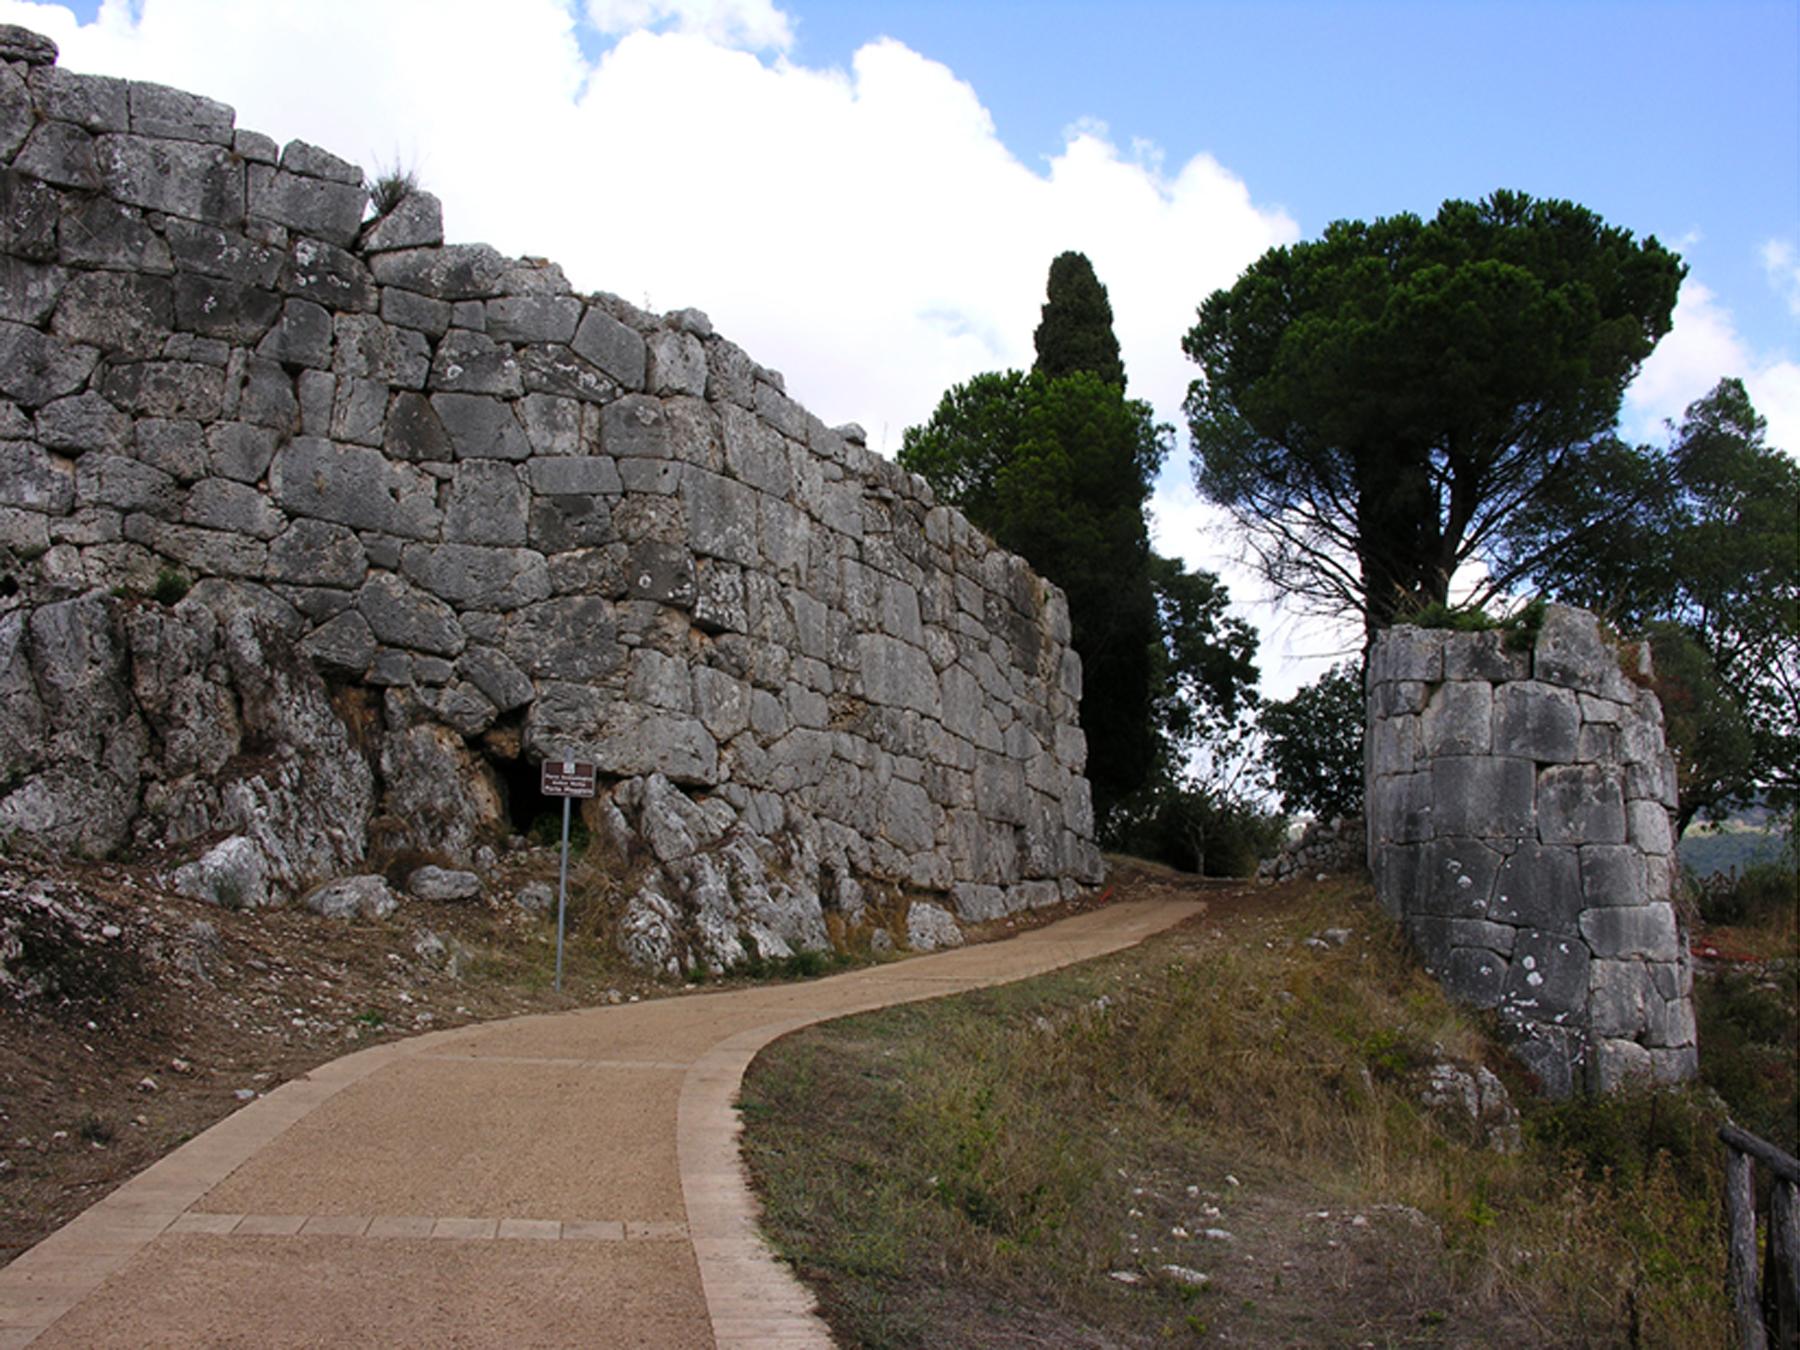 ParcoArcheologicodiNorba_PortaMaggiore_01.jpg